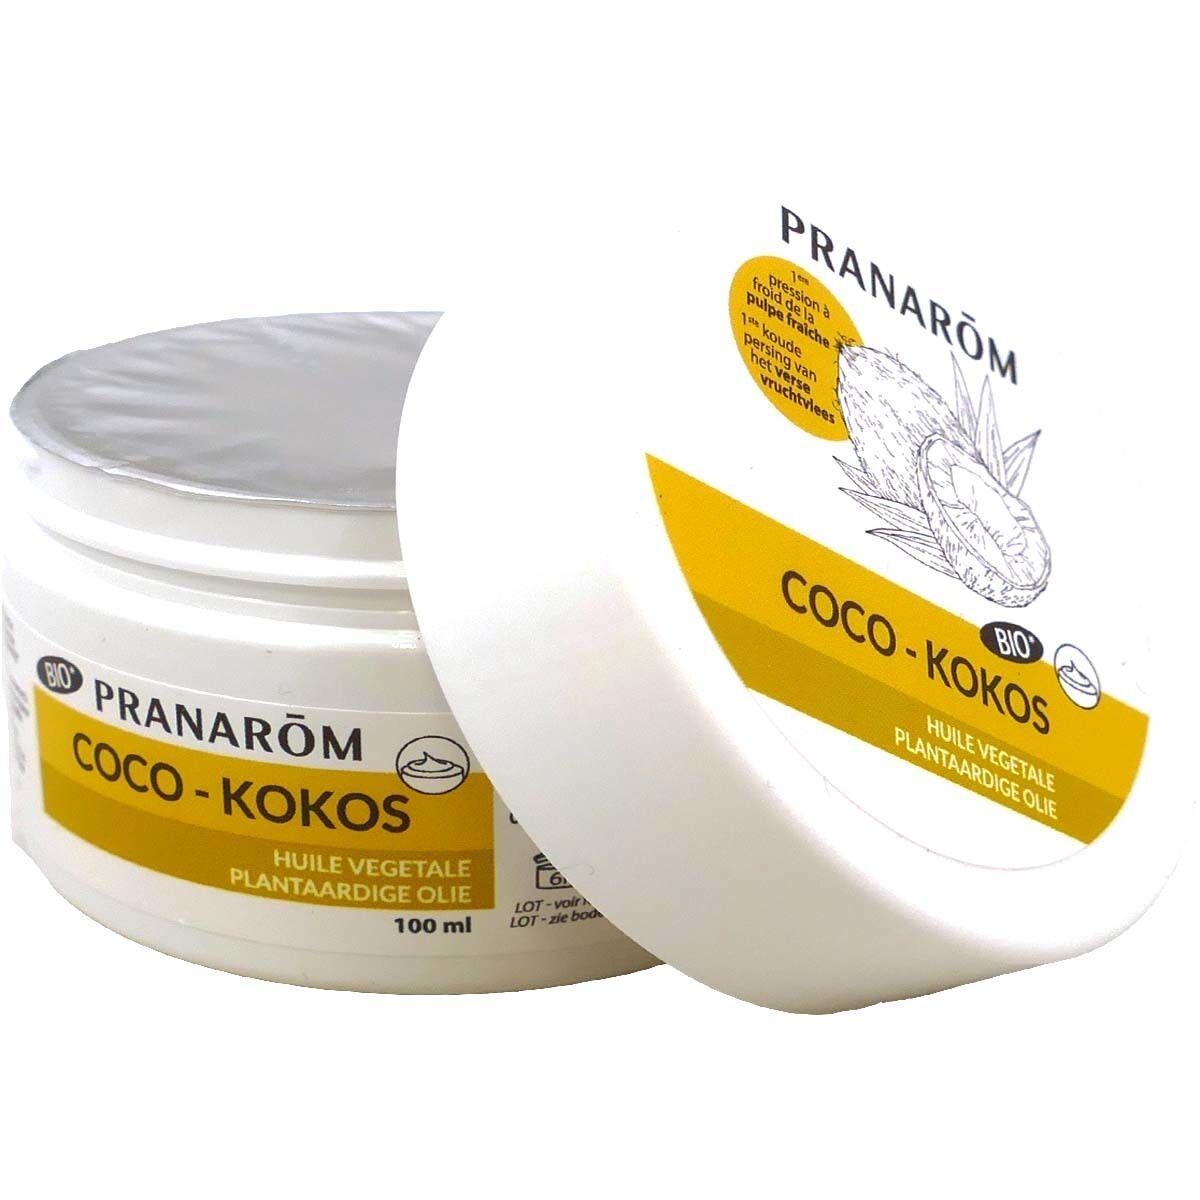 Pranarom huile vegetale coco-kokos bio 100 ml